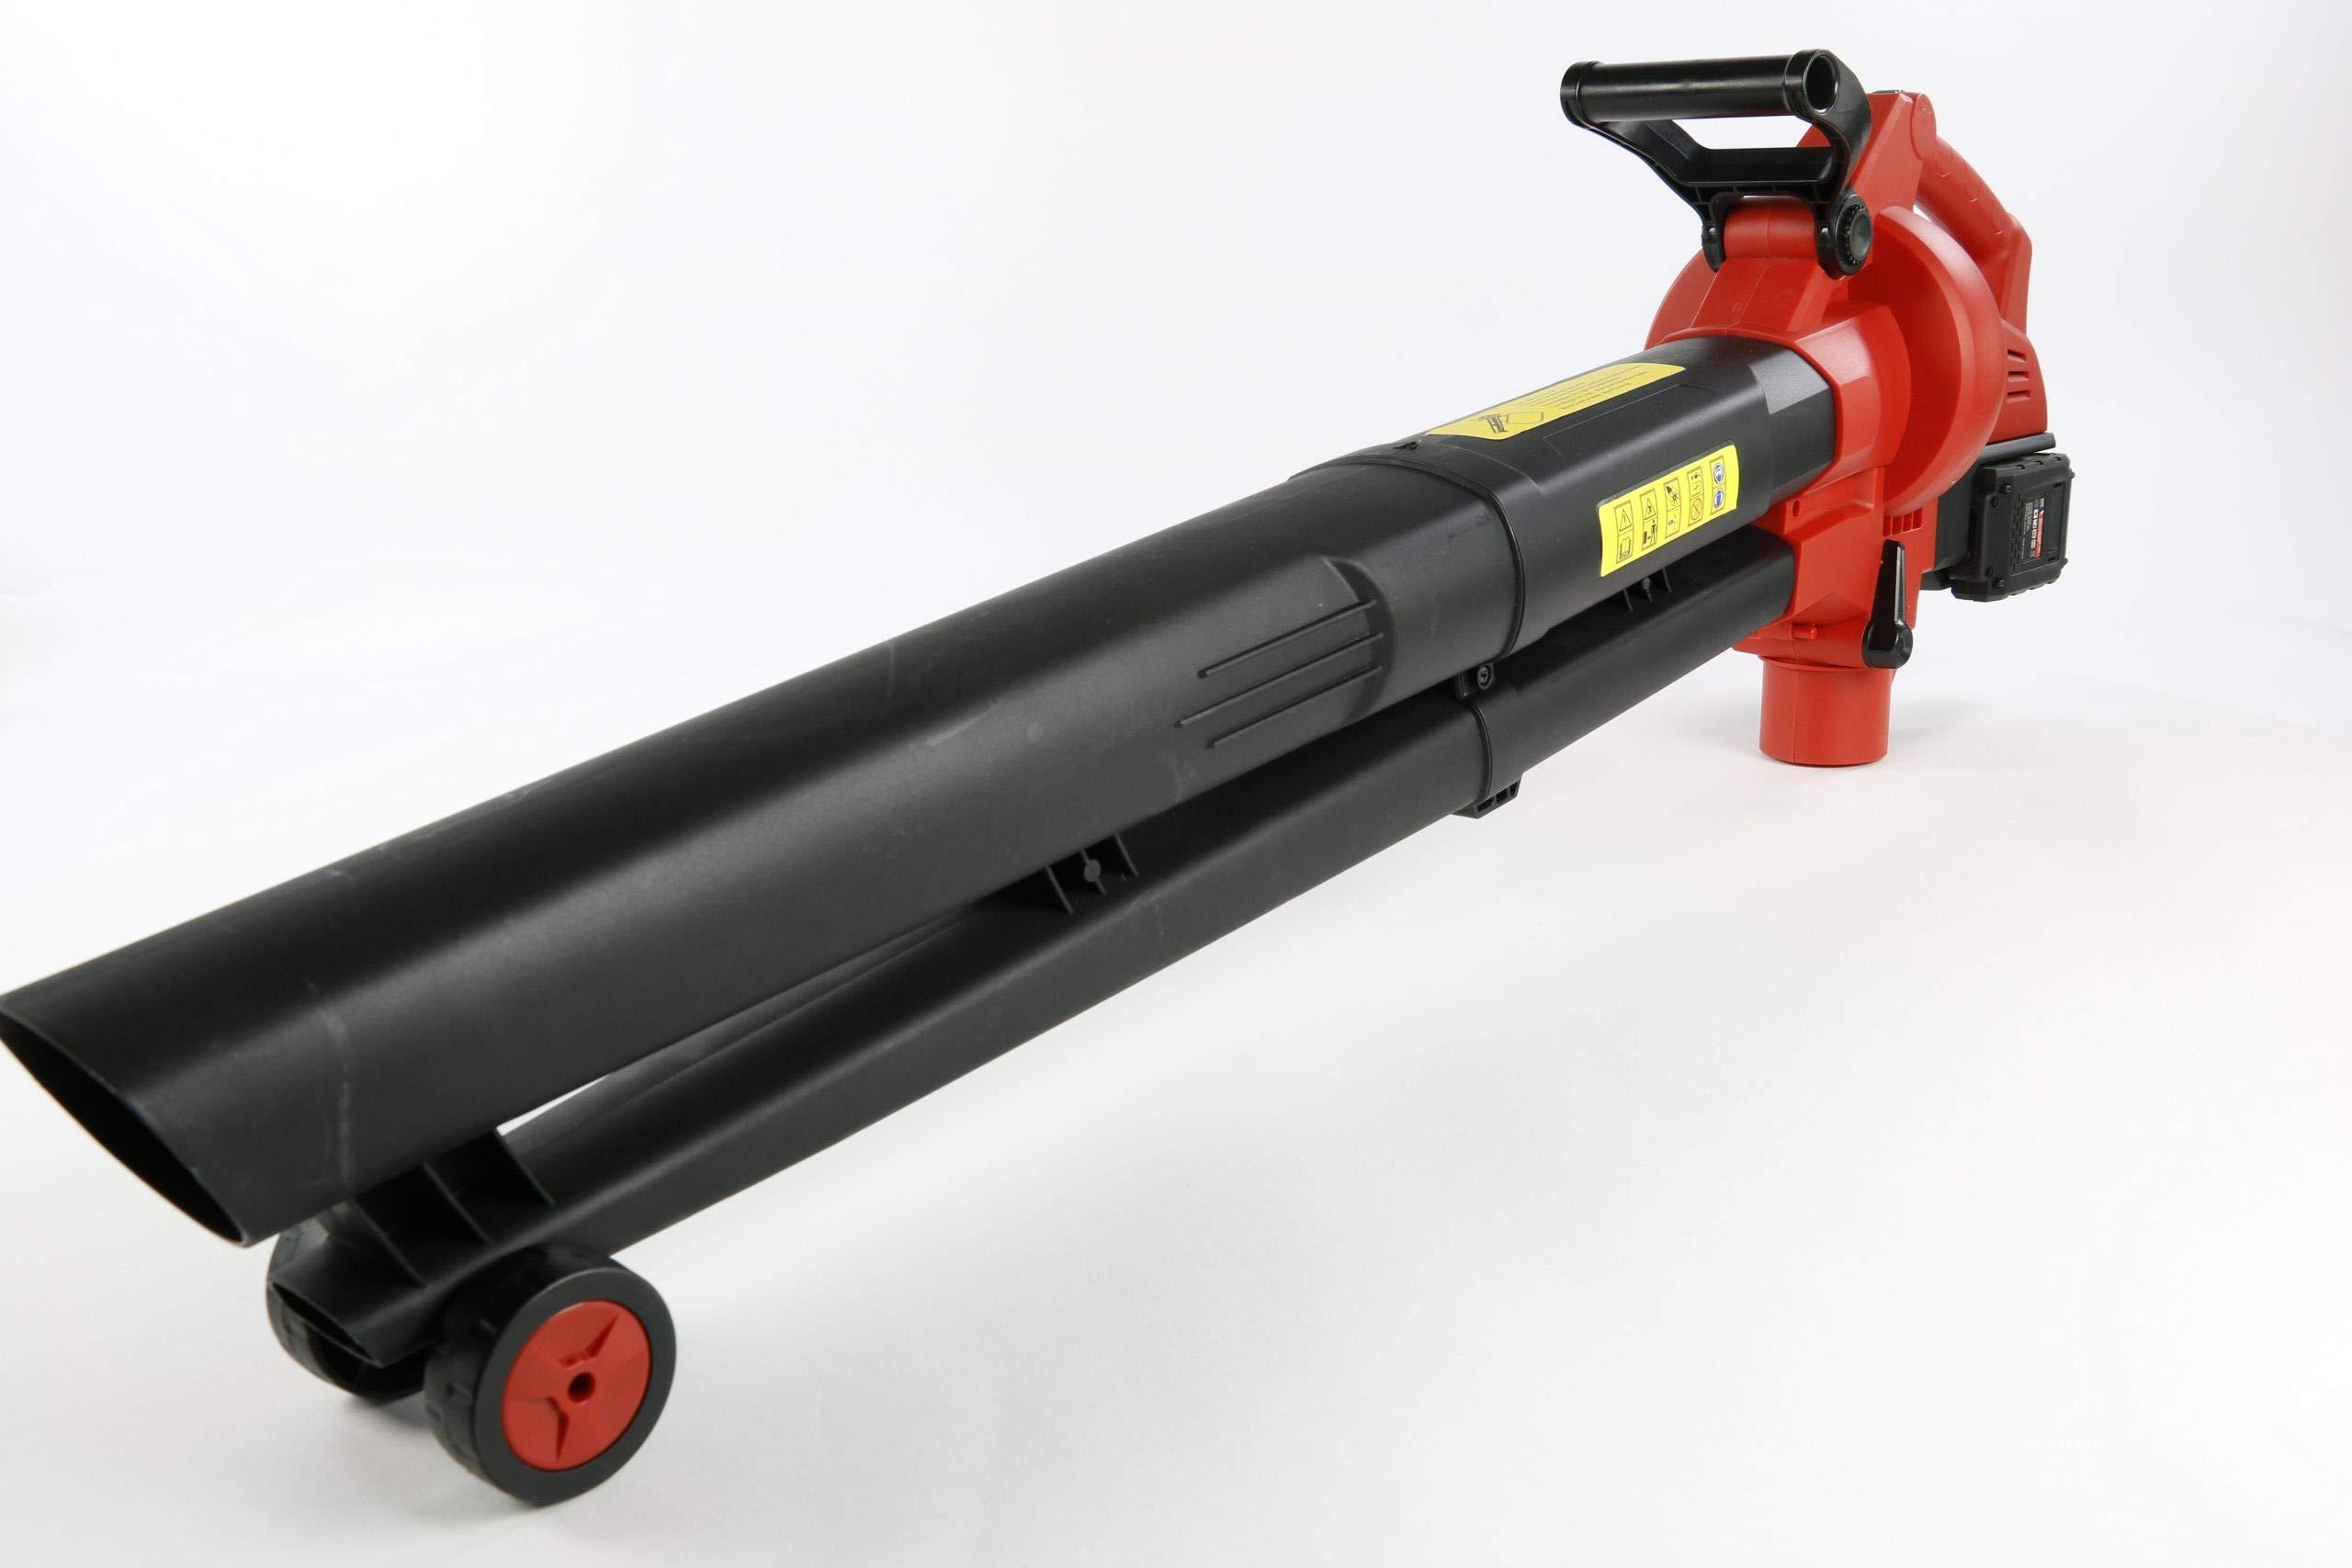 Matrix-511010595-CLB-2x20V-X-ONE-Laubsauger-inklusive-2-20-V-Akkus-6000-12000-Umin-mit-Hcksler-Elektronische-Drehzahlregelung-230-KMH-Luftgeschwindigkeit-45L-Fangsack-Rot-Schwarz